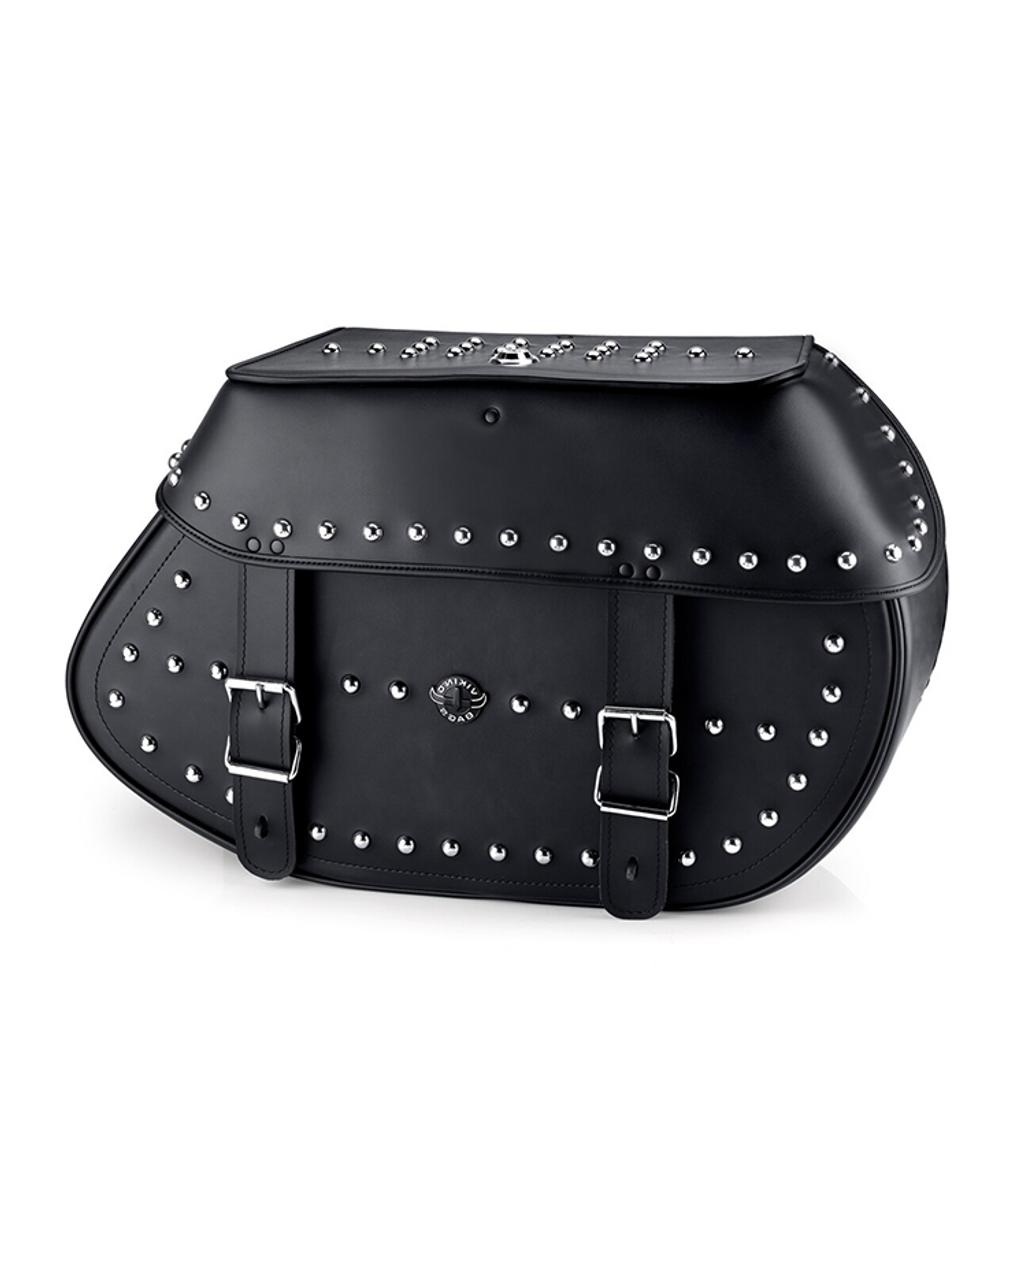 Viking Specific Studded Extra Large Saddlebags For Harley Softail Custom FXSTC Main Bag